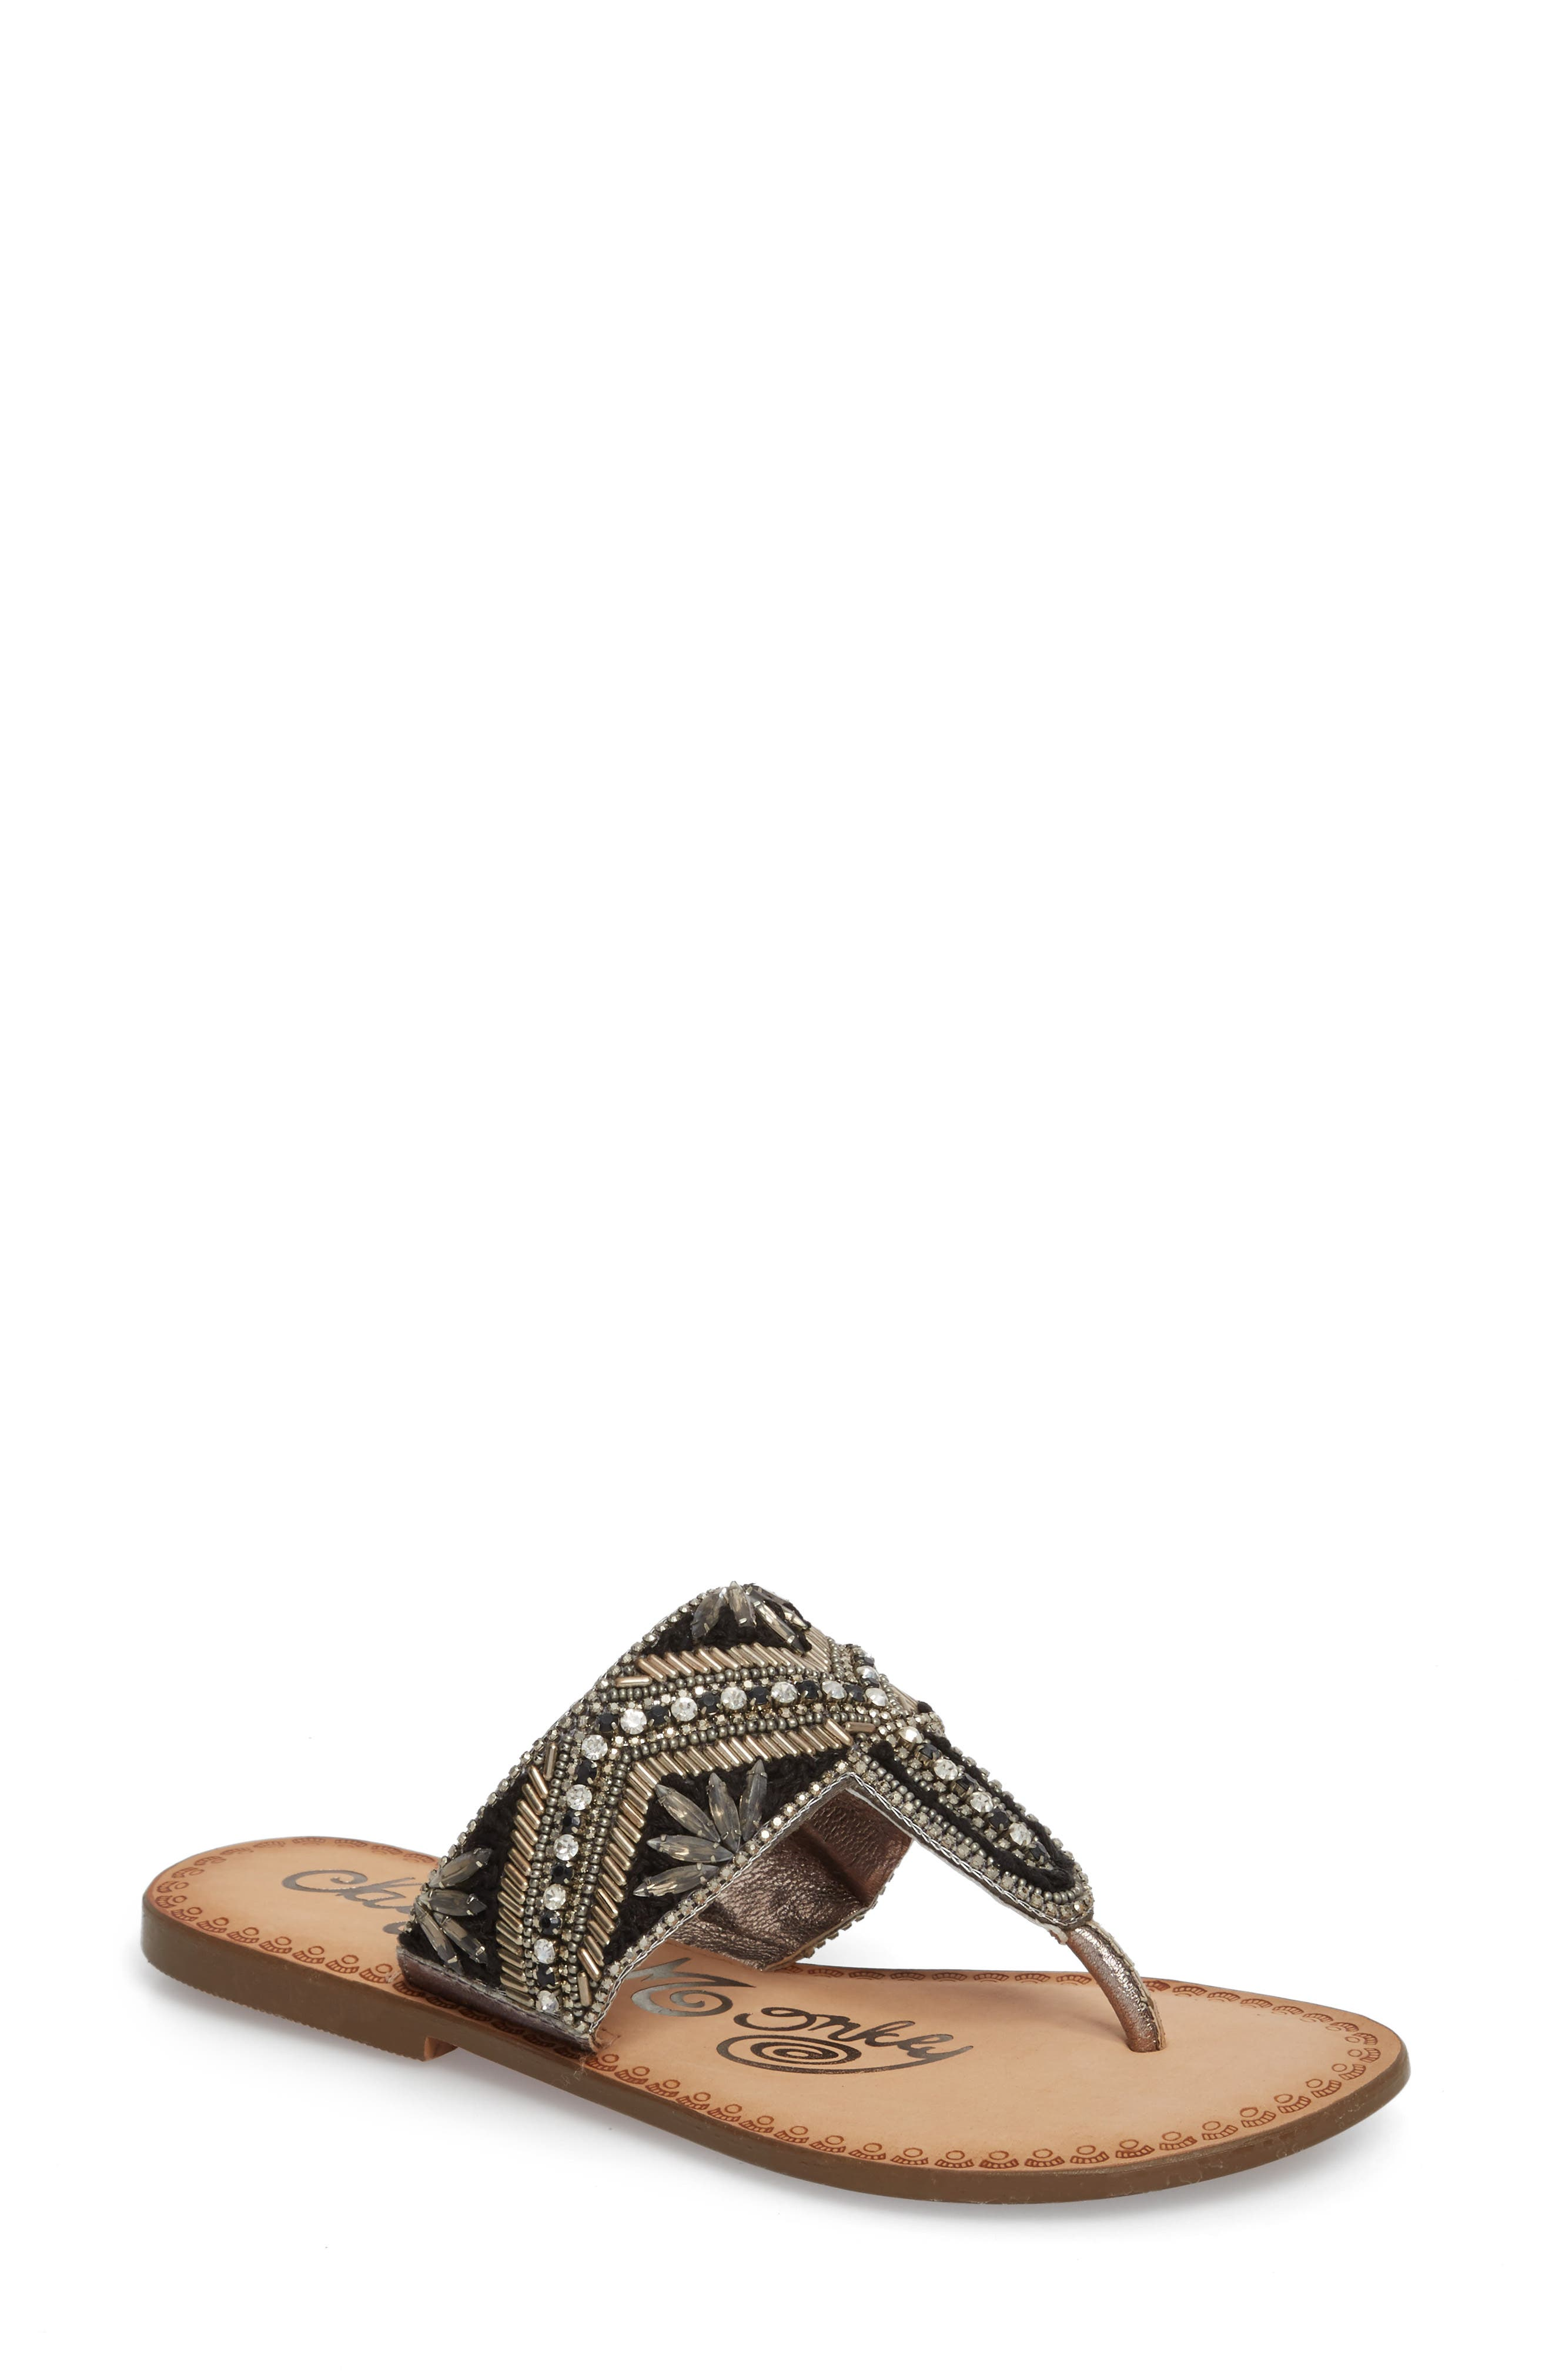 Beaded Sandal,                         Main,                         color,